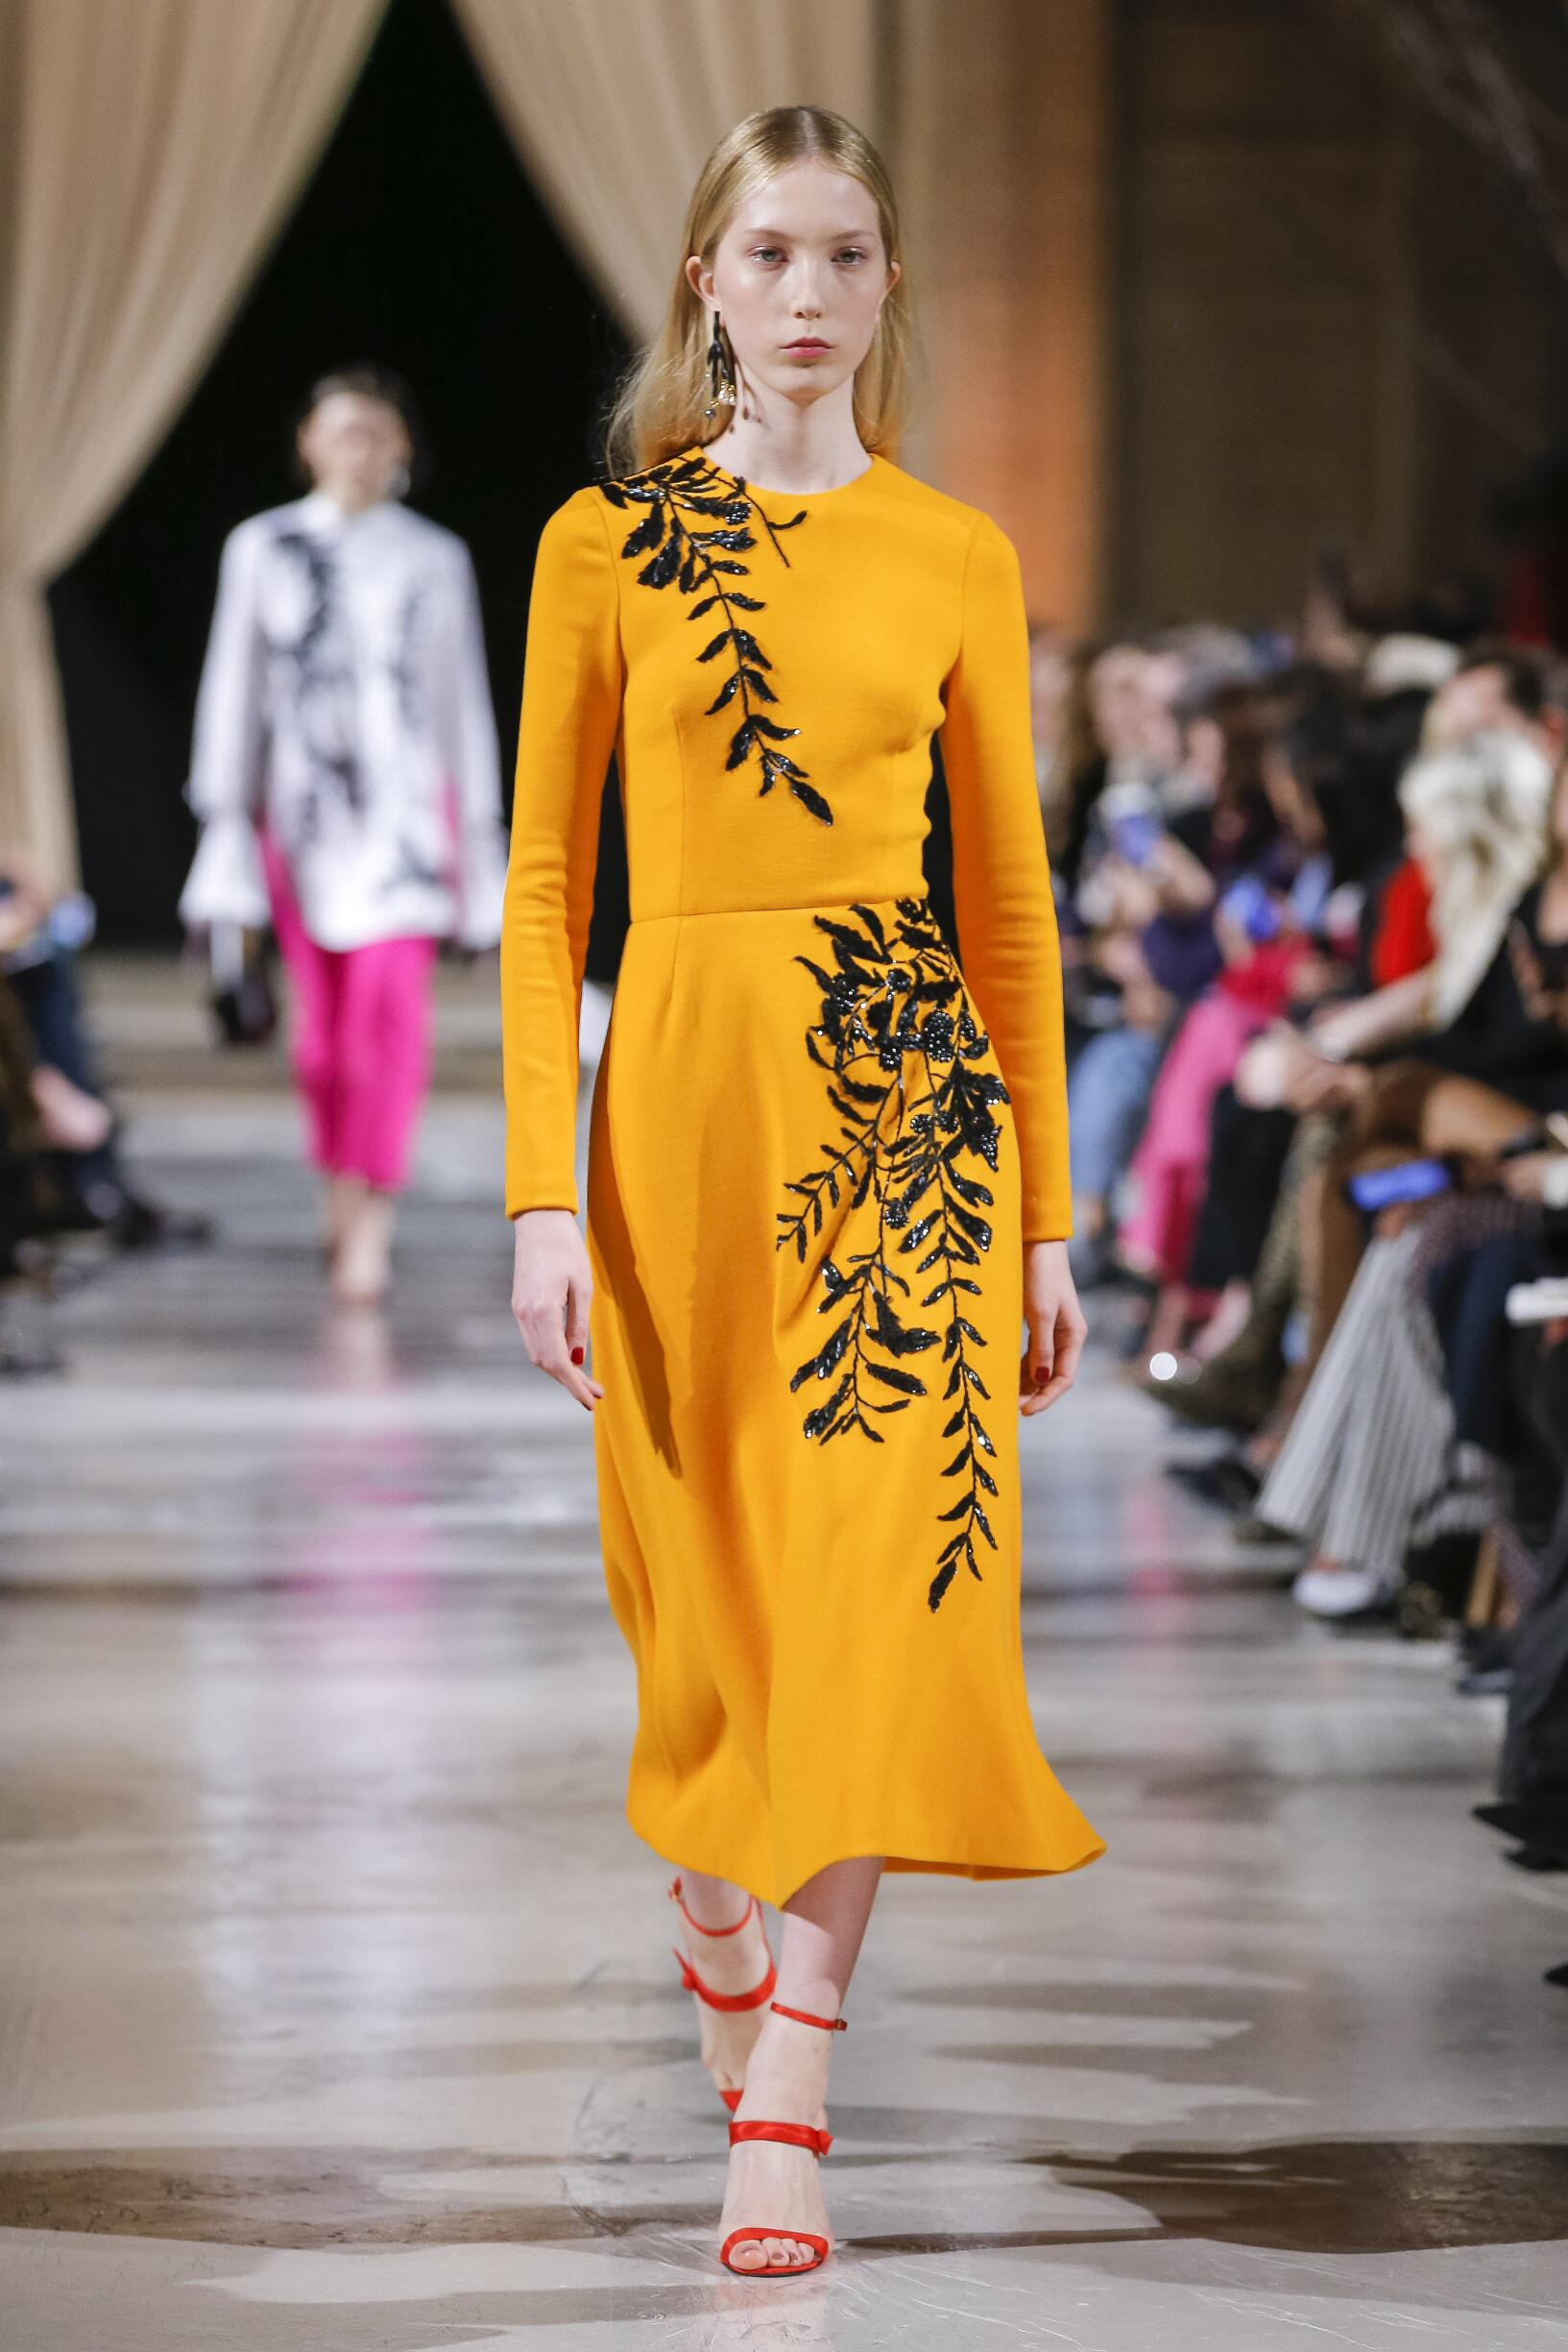 Model Fashion Show Oscar de la Renta